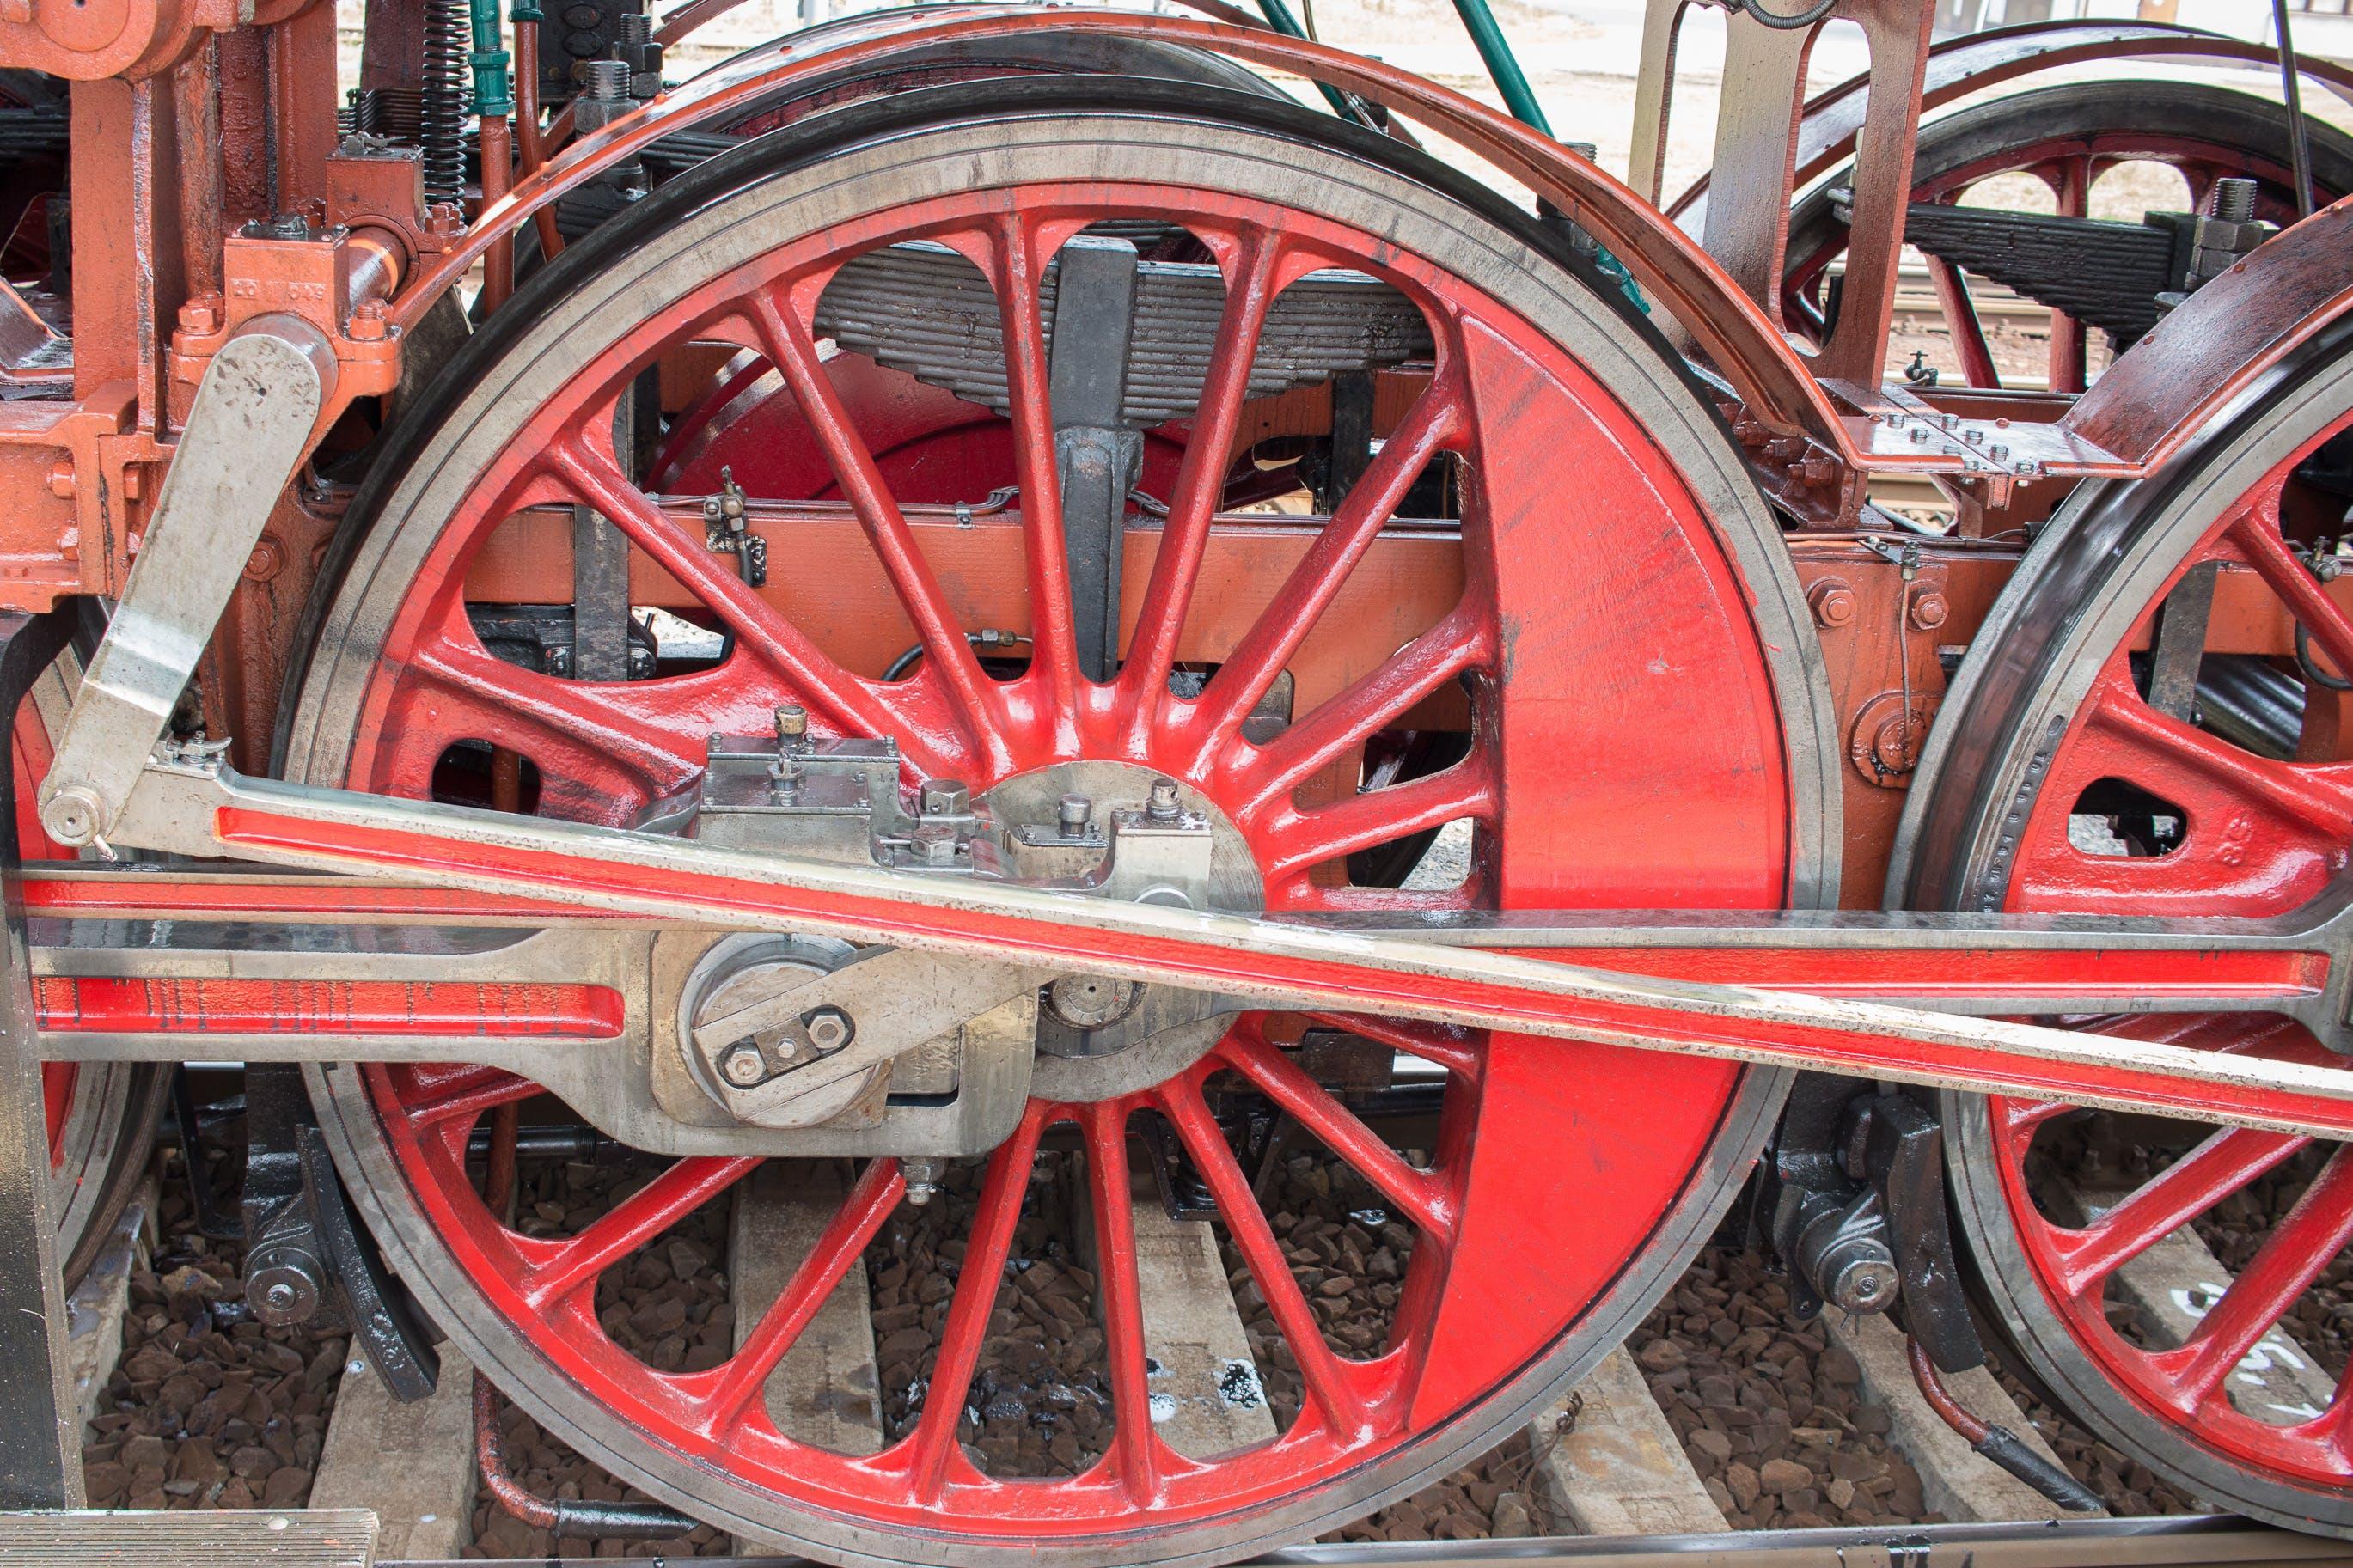 Free stock photo of Steam train wheel, train wheel